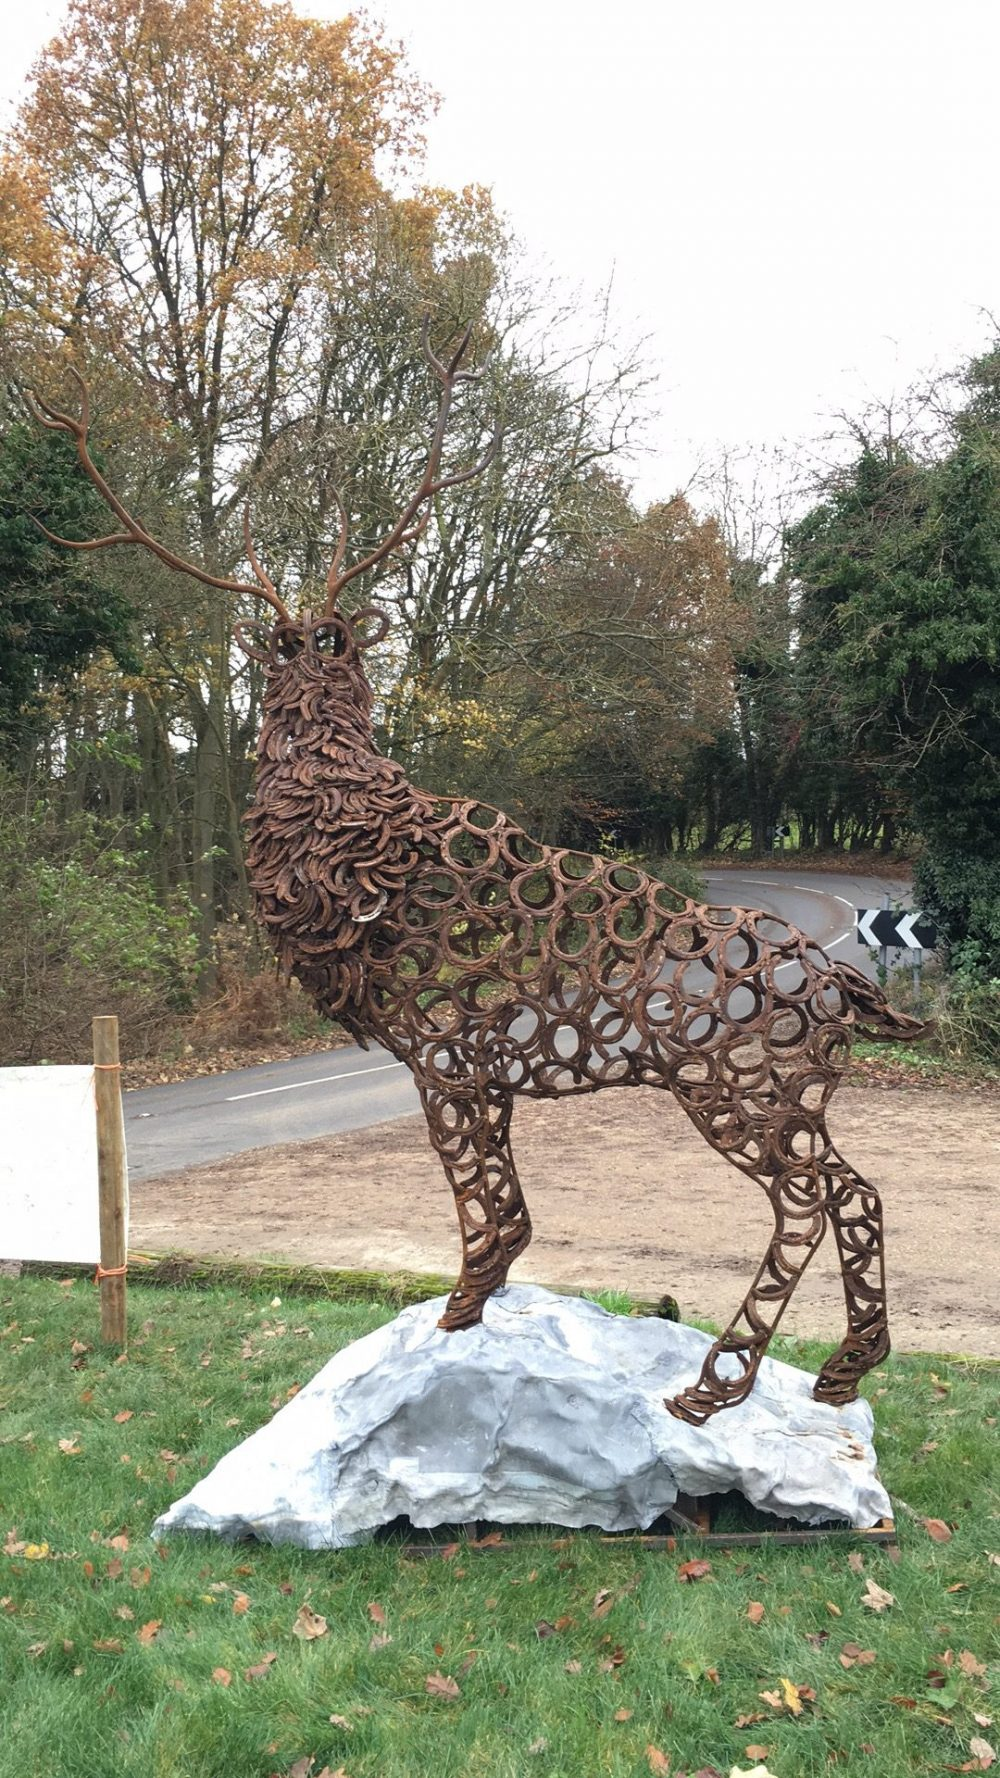 Portrait View Of Stag Sculpture